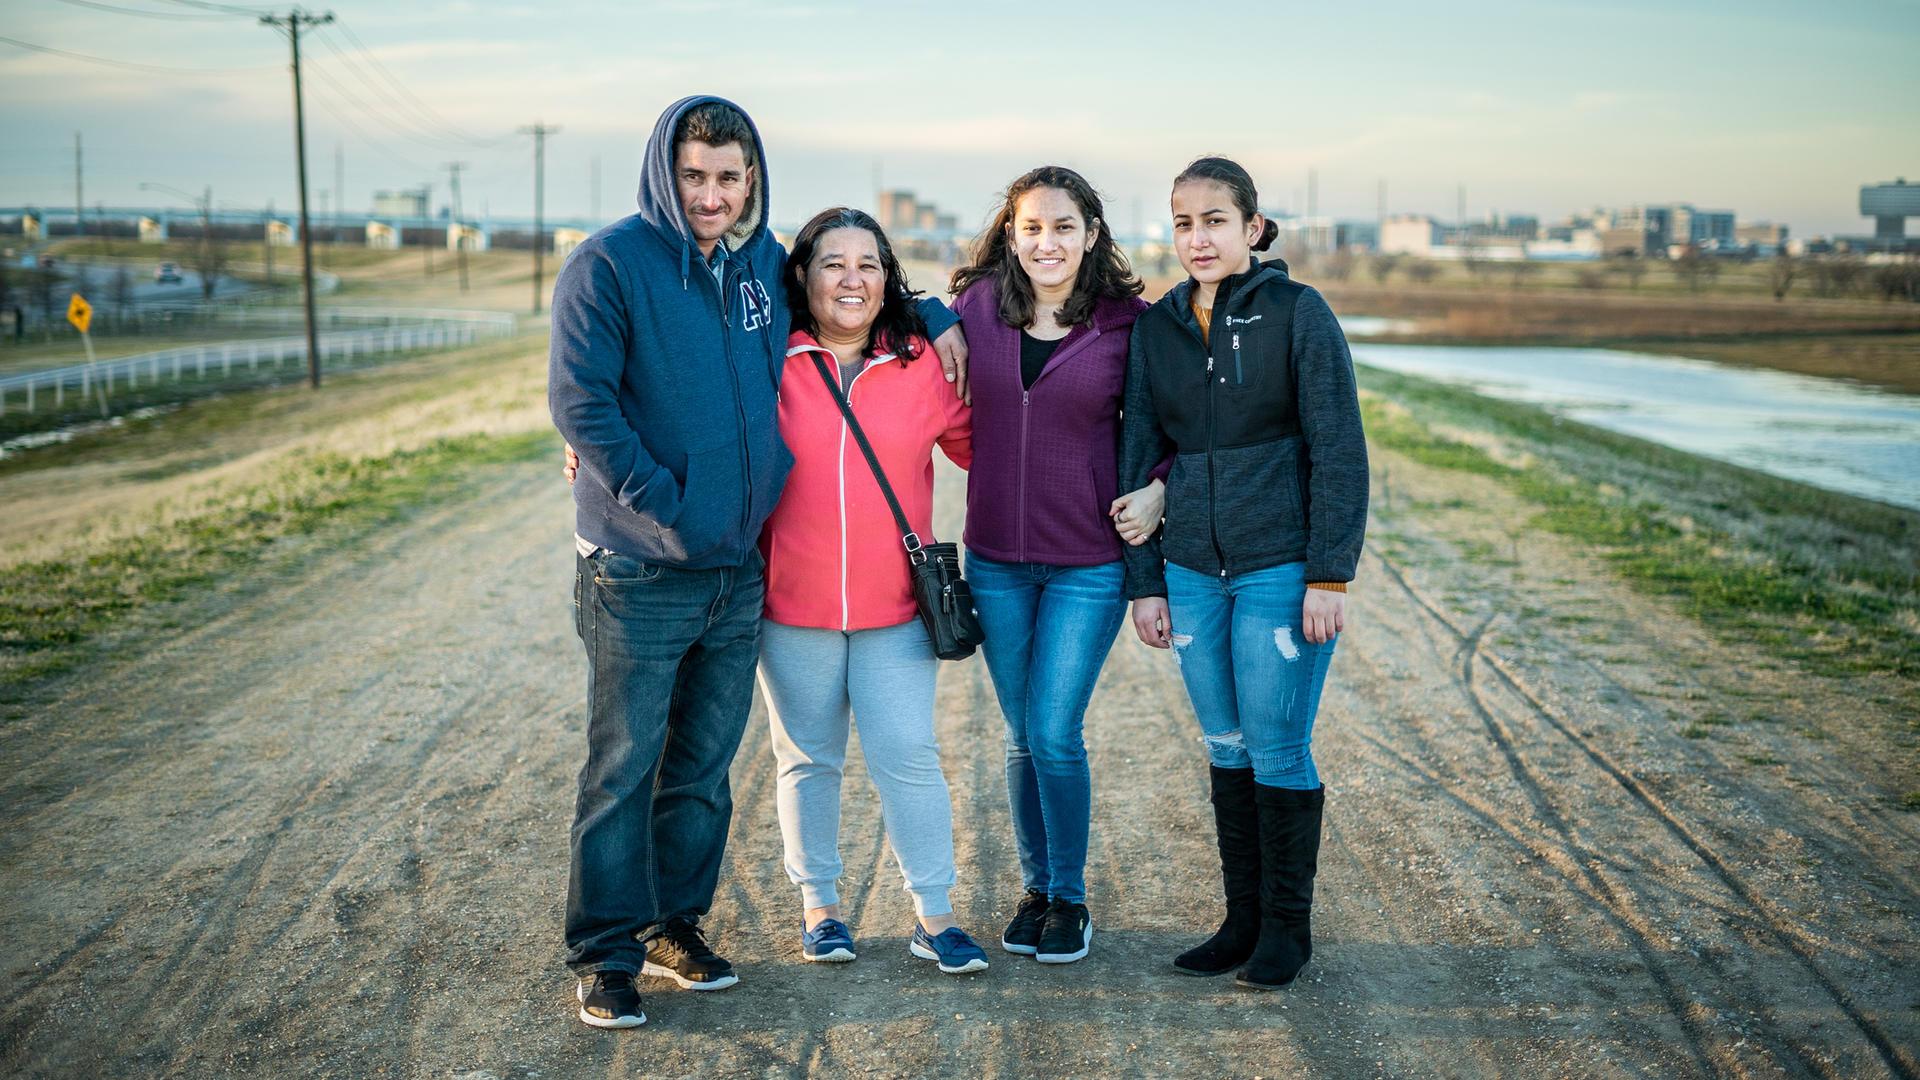 Salvadoran refugee family in Dallas